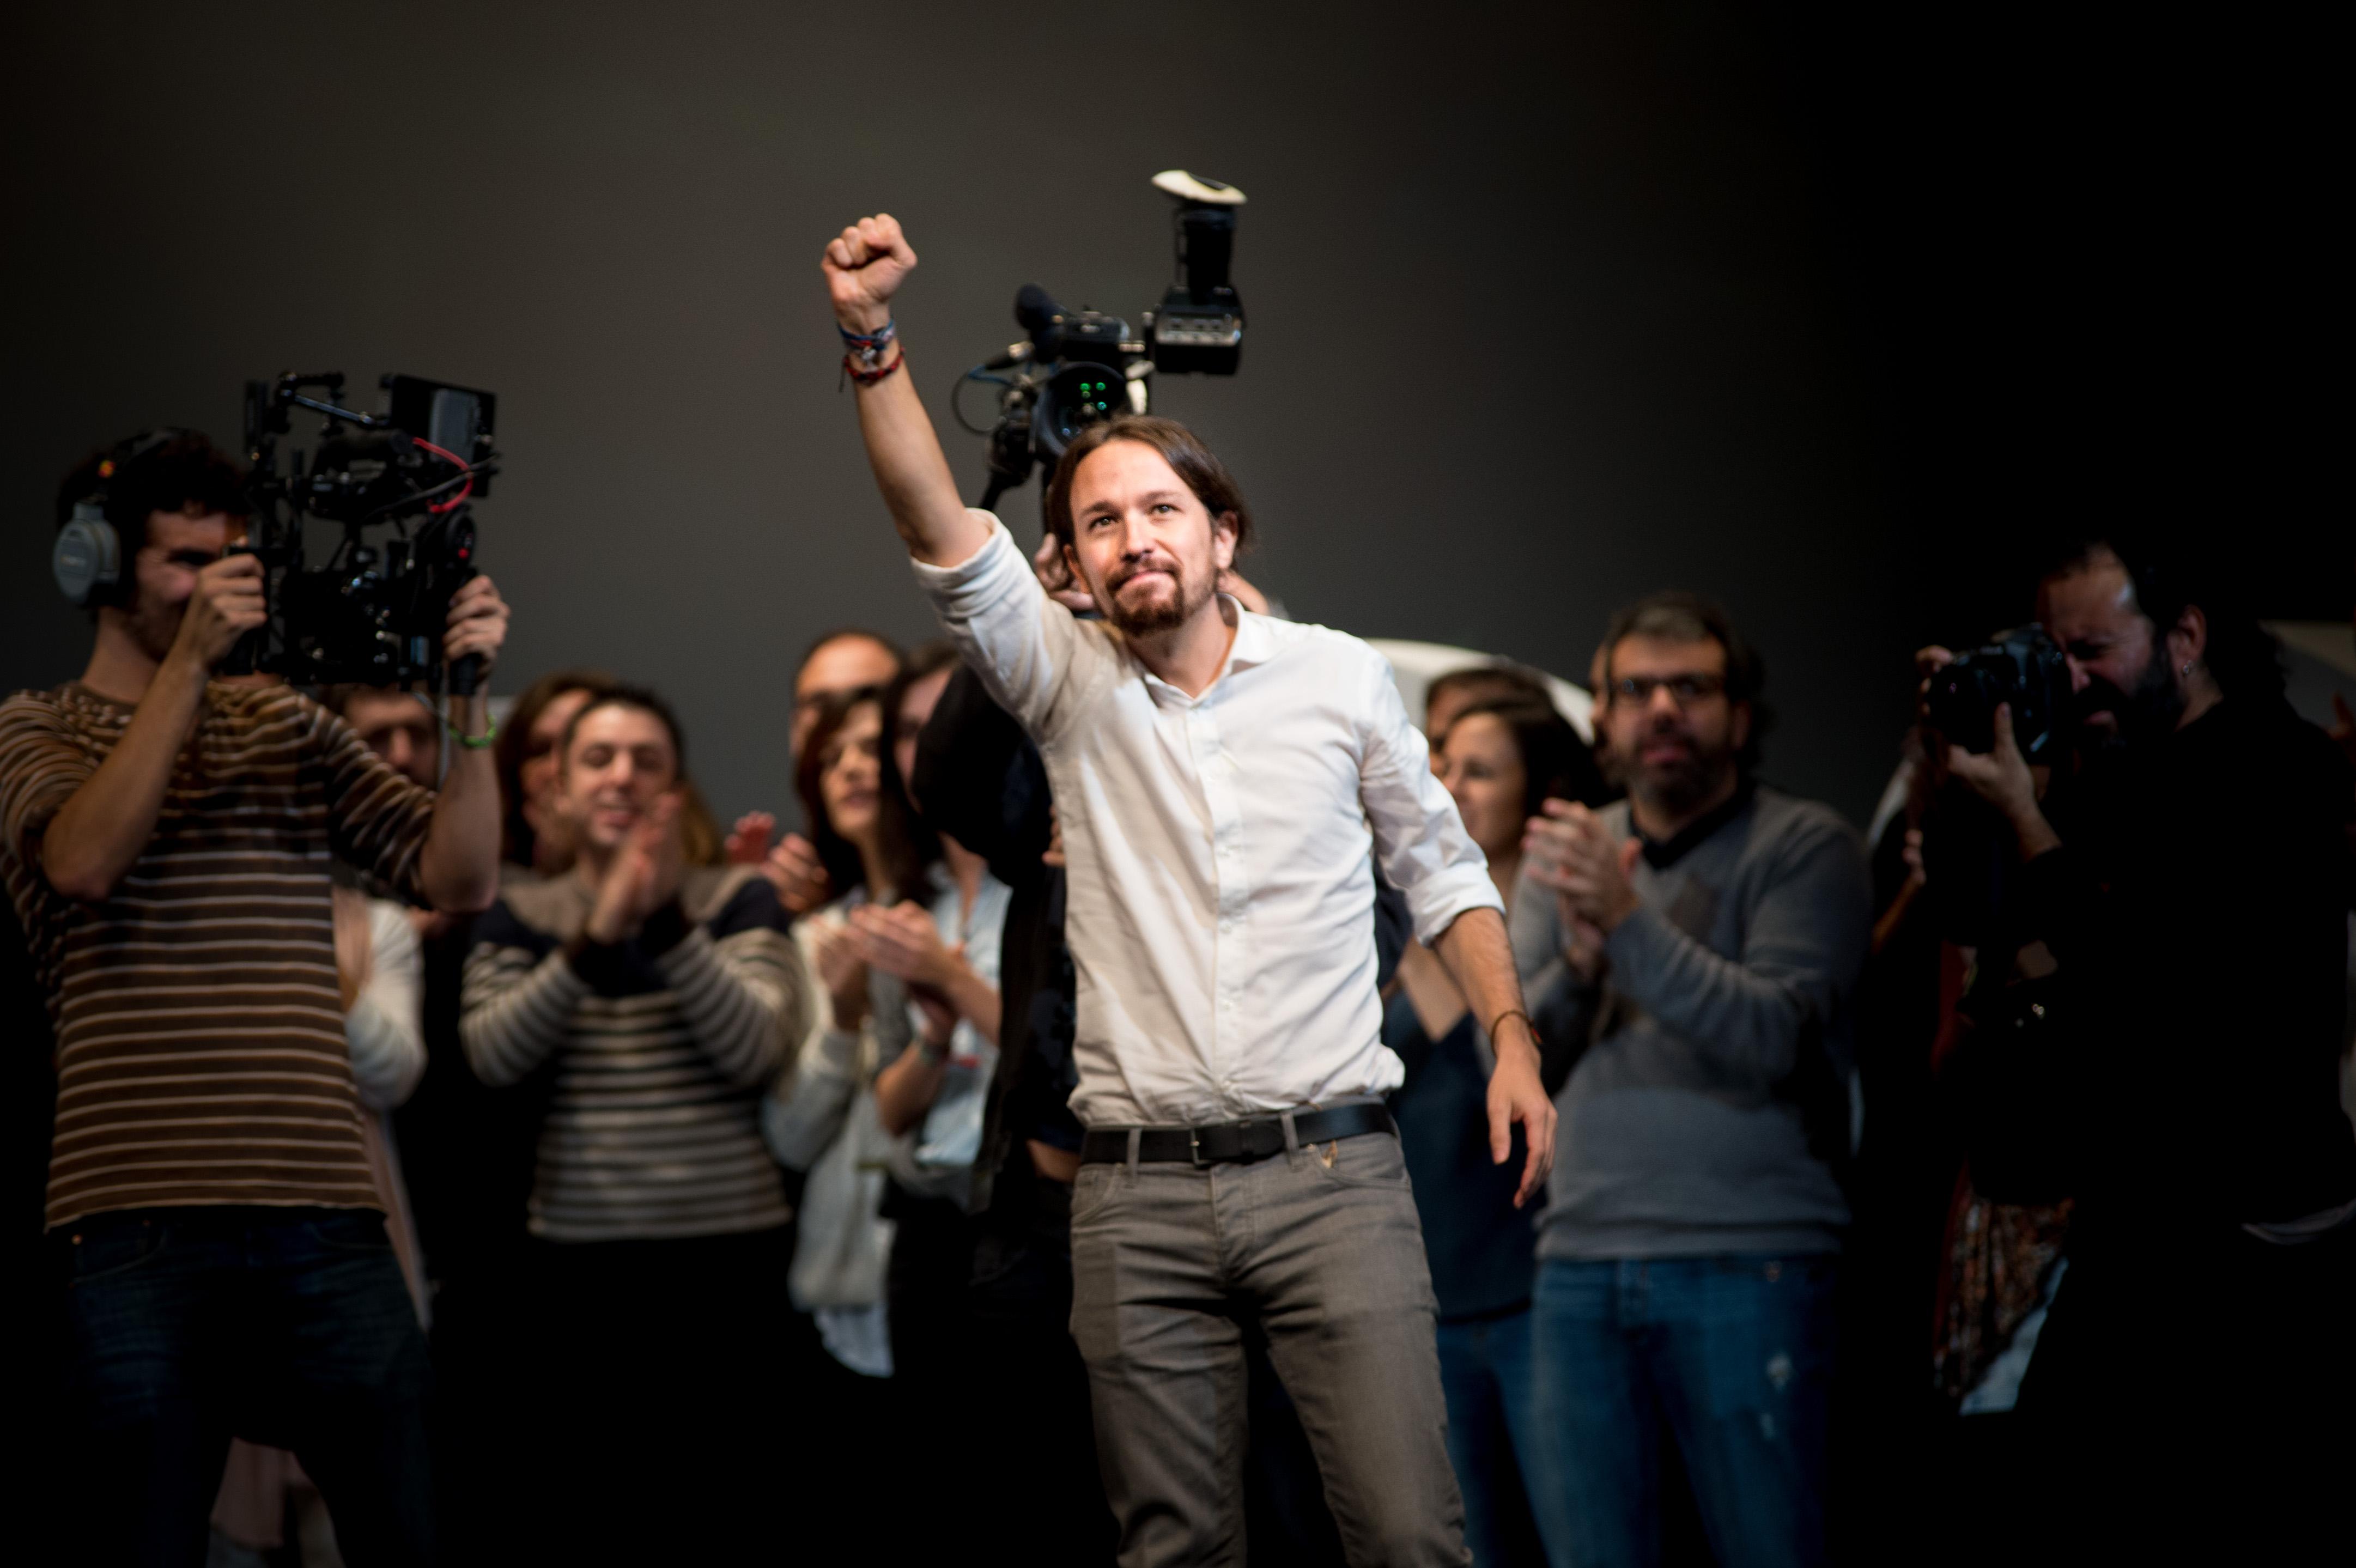 Podemos una historia de triunfo Podemos